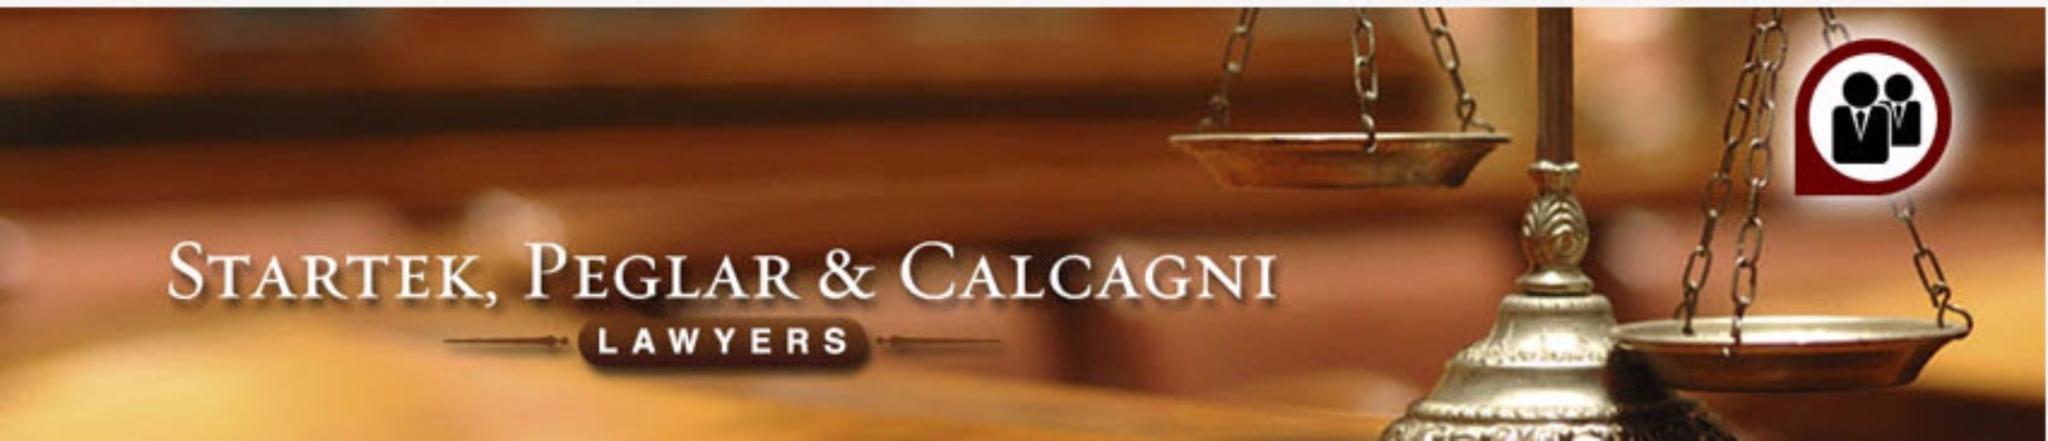 Startek Peglar & Calcagni LLP